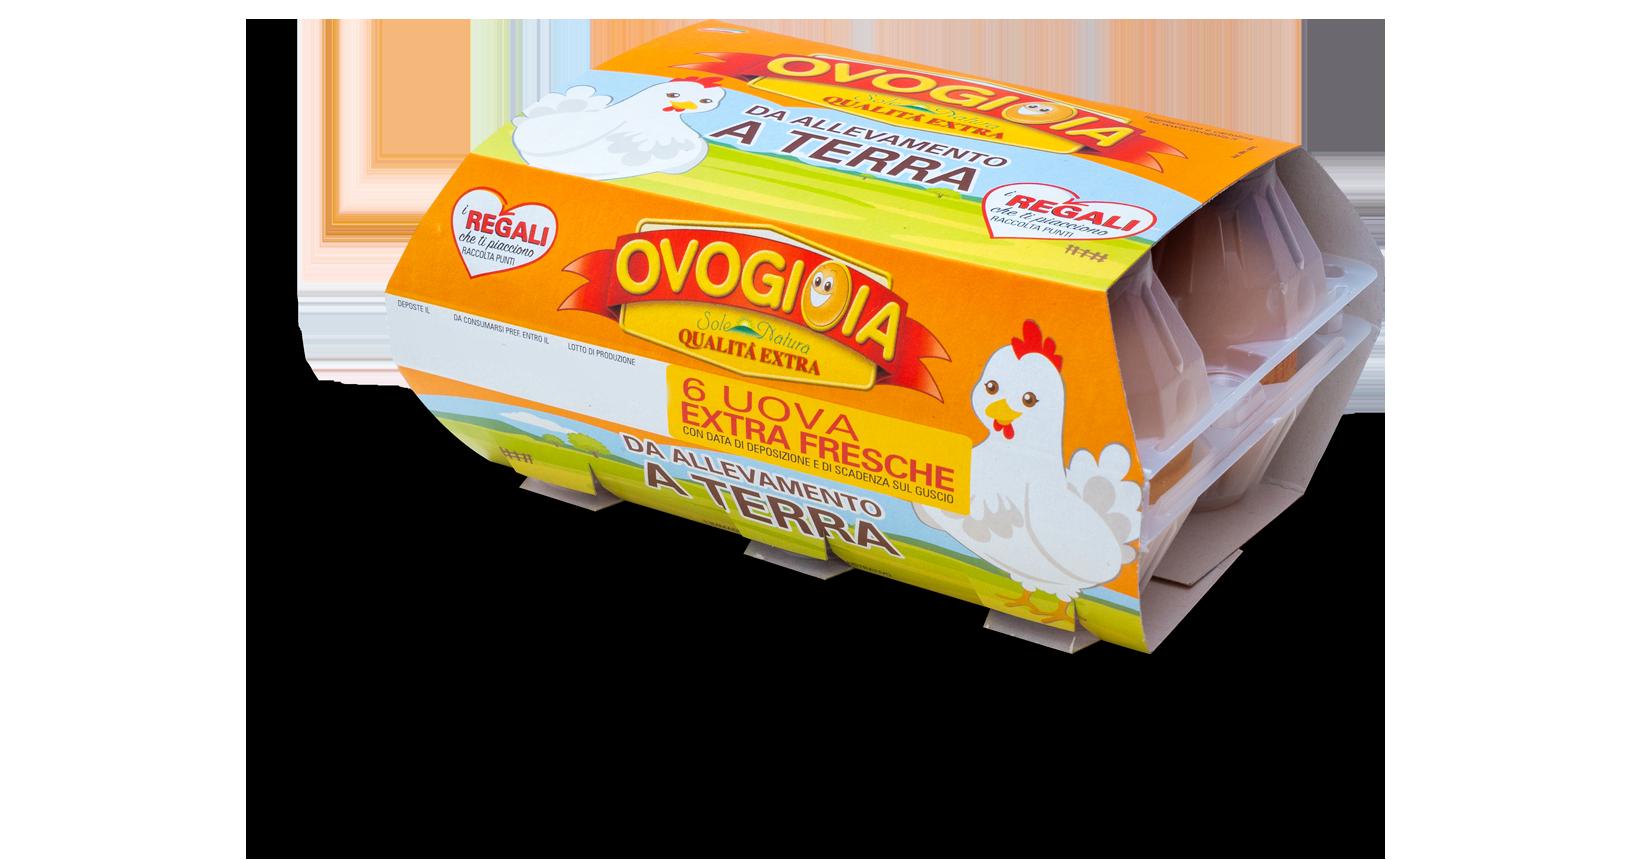 6 uova extra fresche